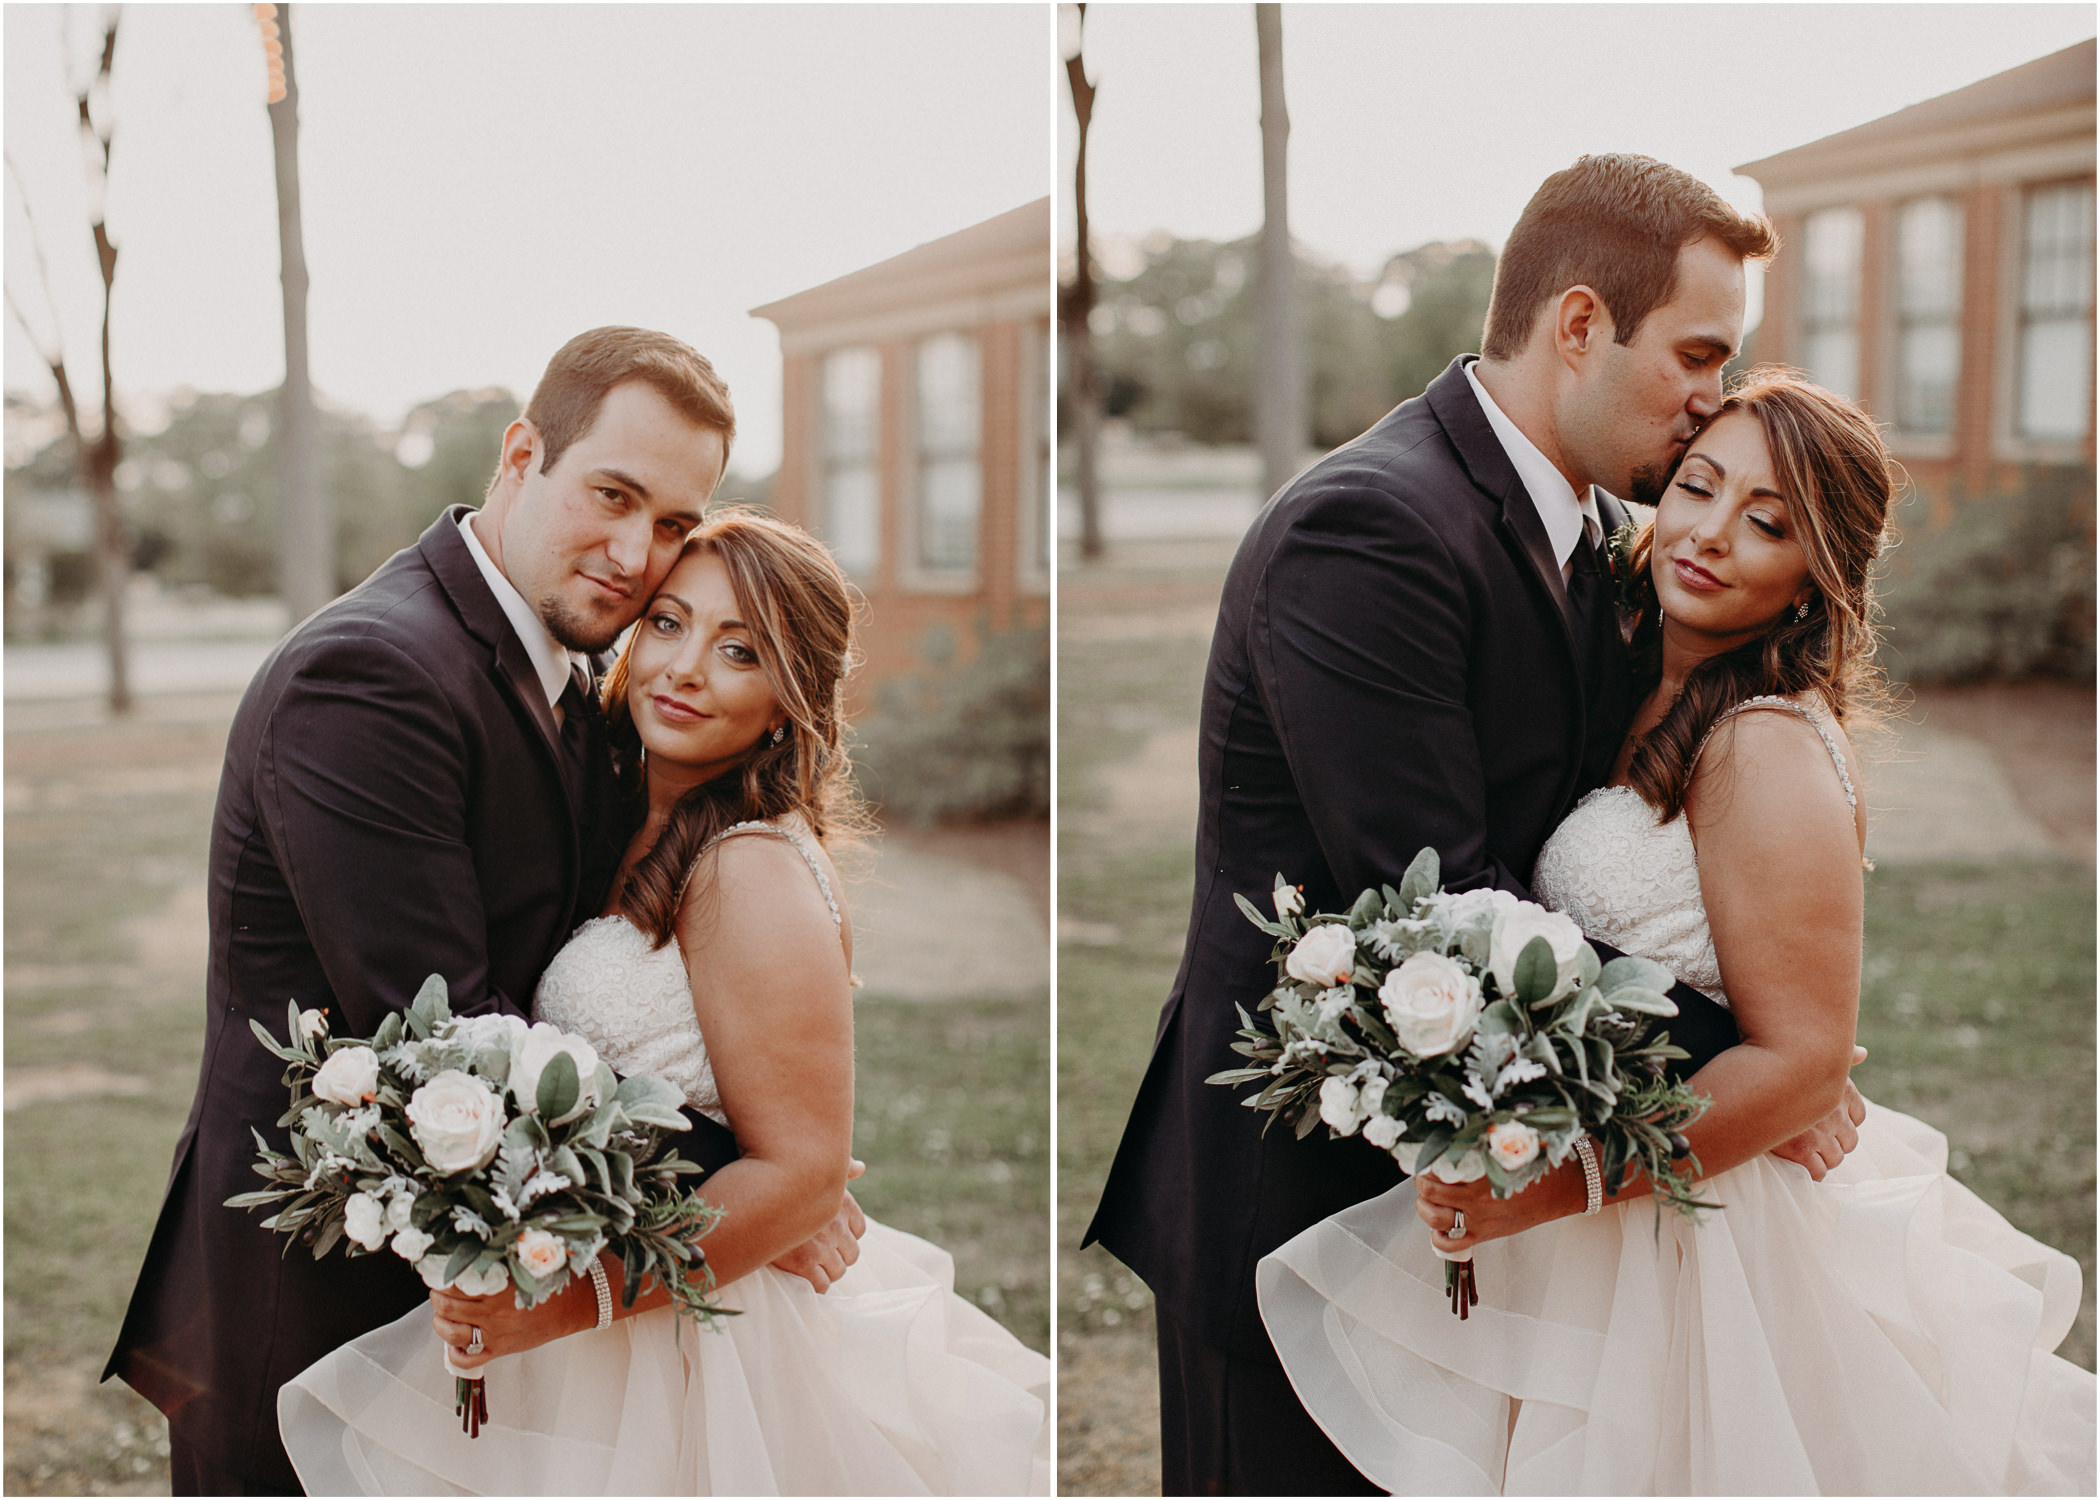 54 4 - Atlanta Wedding Photographer - The engine room - Ga - Wedding trends - Aline Marin Photography.jpg